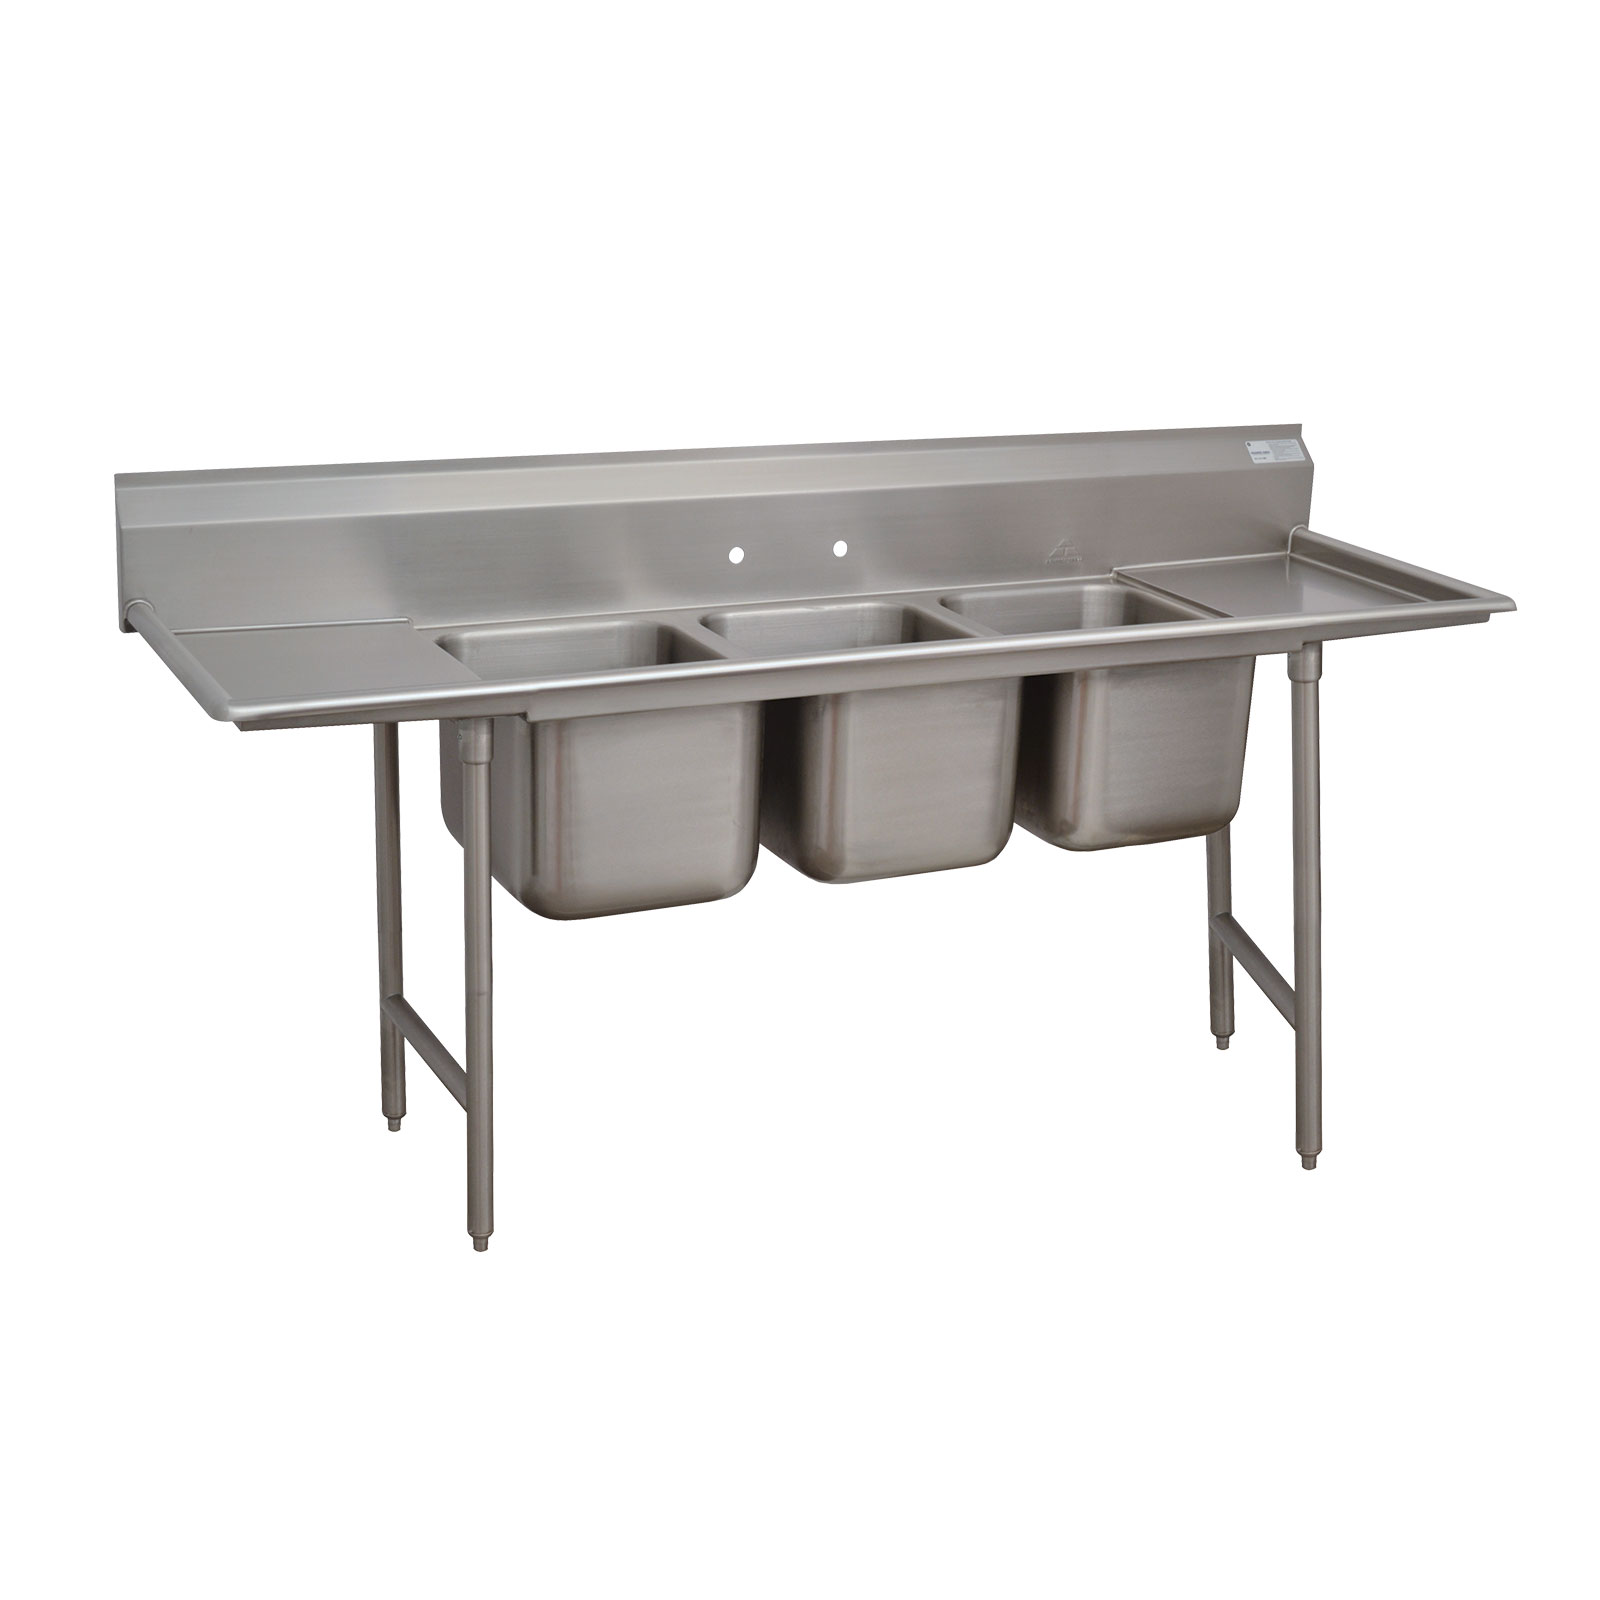 Advance Tabco 93-23-60-36RL sink, (3) three compartment